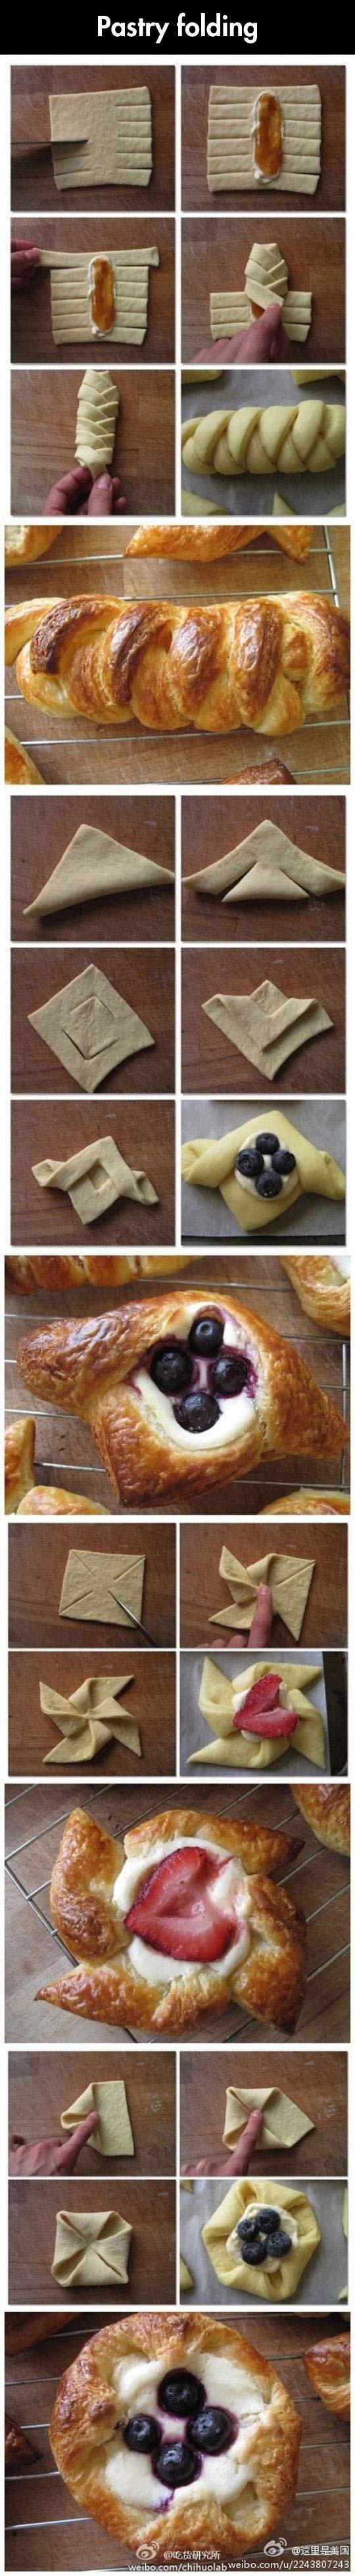 funny-pastry-folder-sweet-blueberry